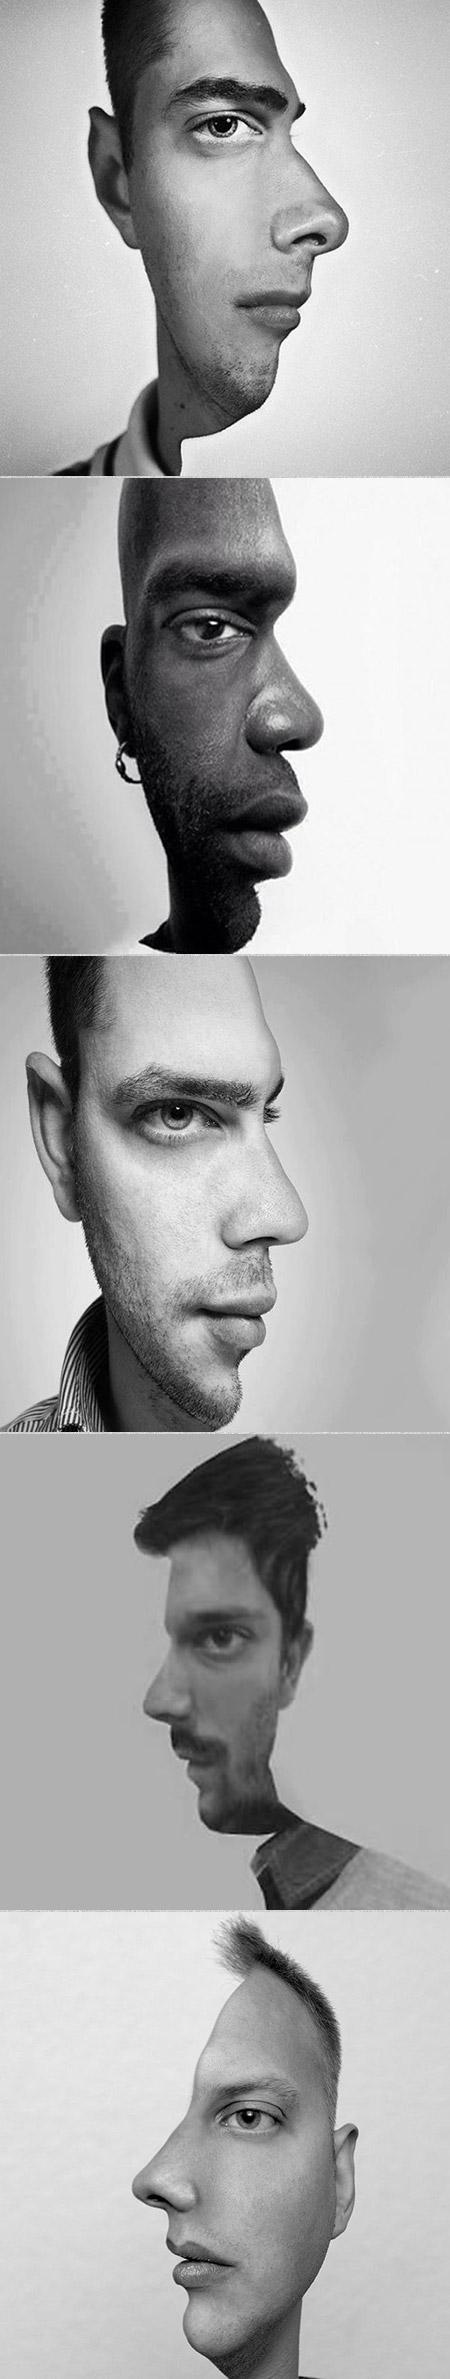 face_illusion_l